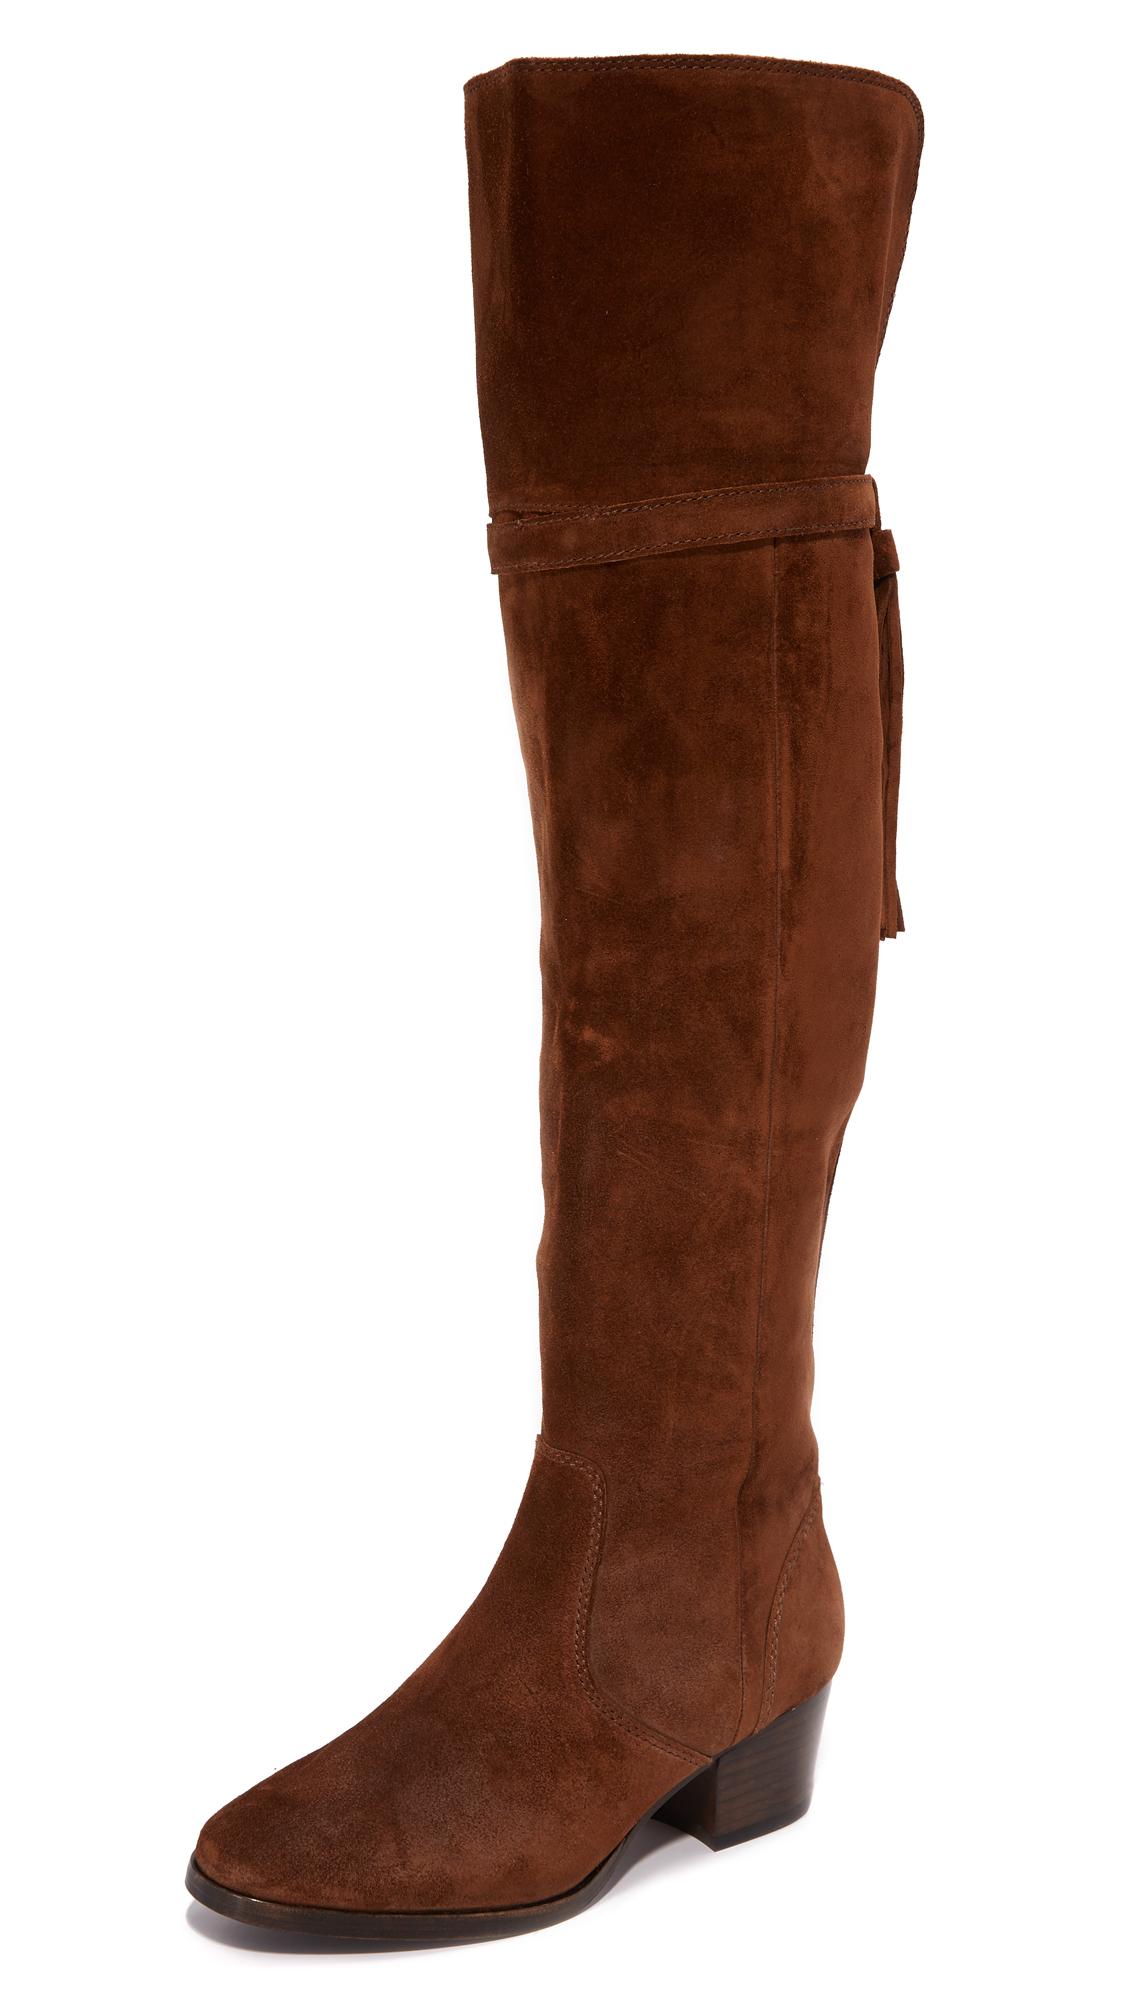 Frye Clara Tassel Over The Knee Boots - Wood